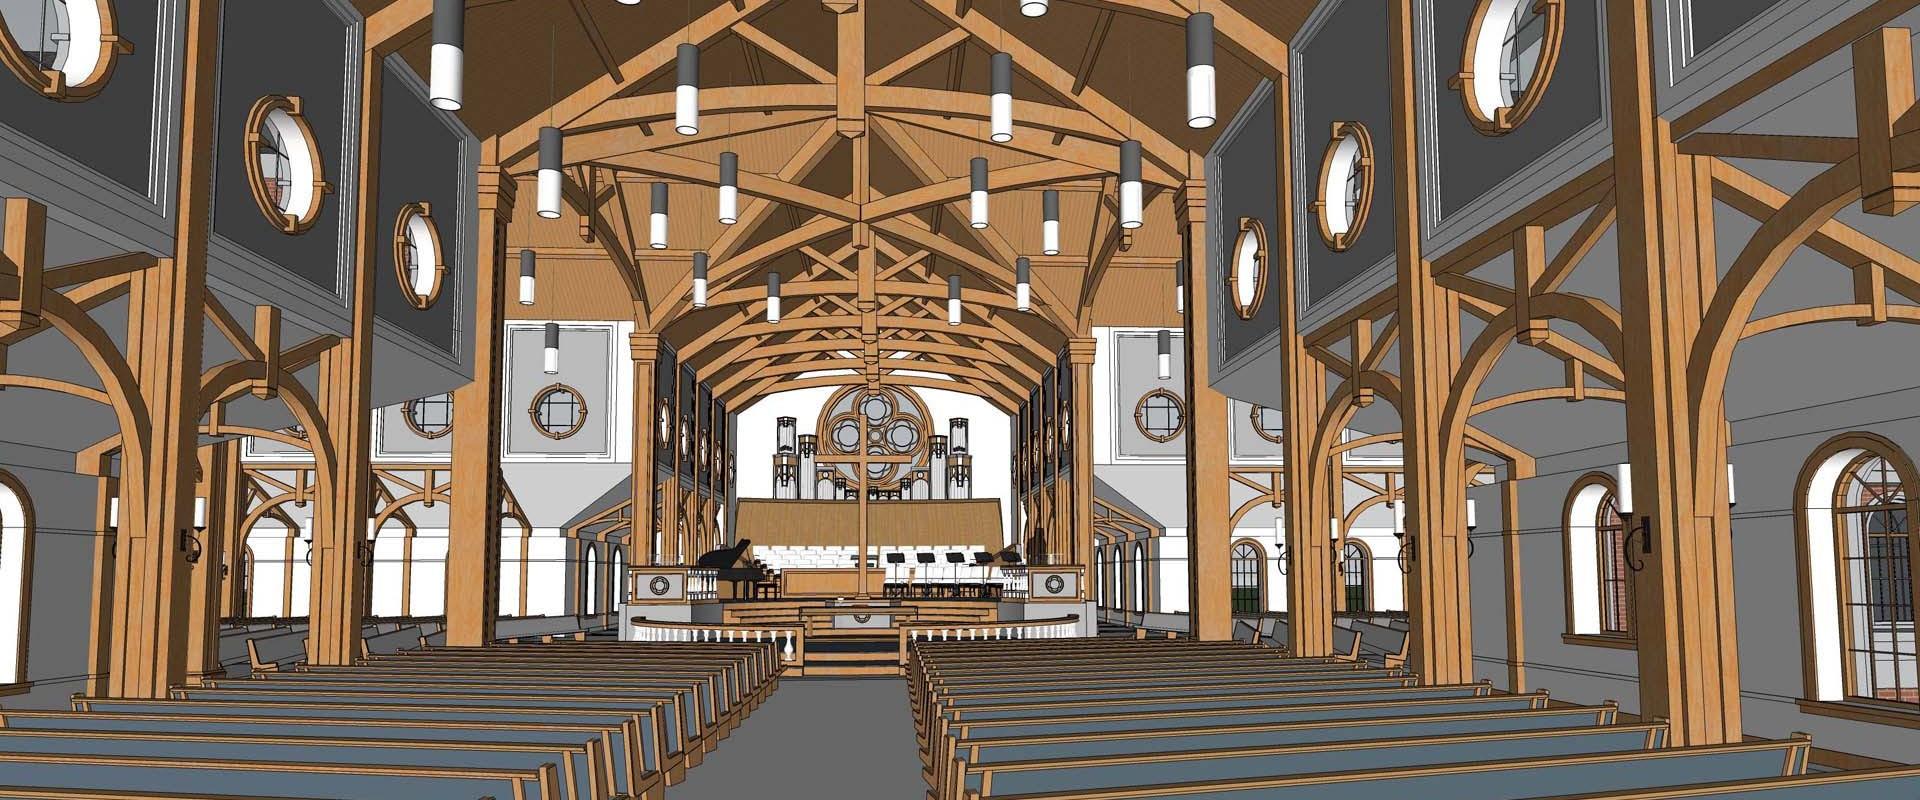 Traditional Church Sanctuary